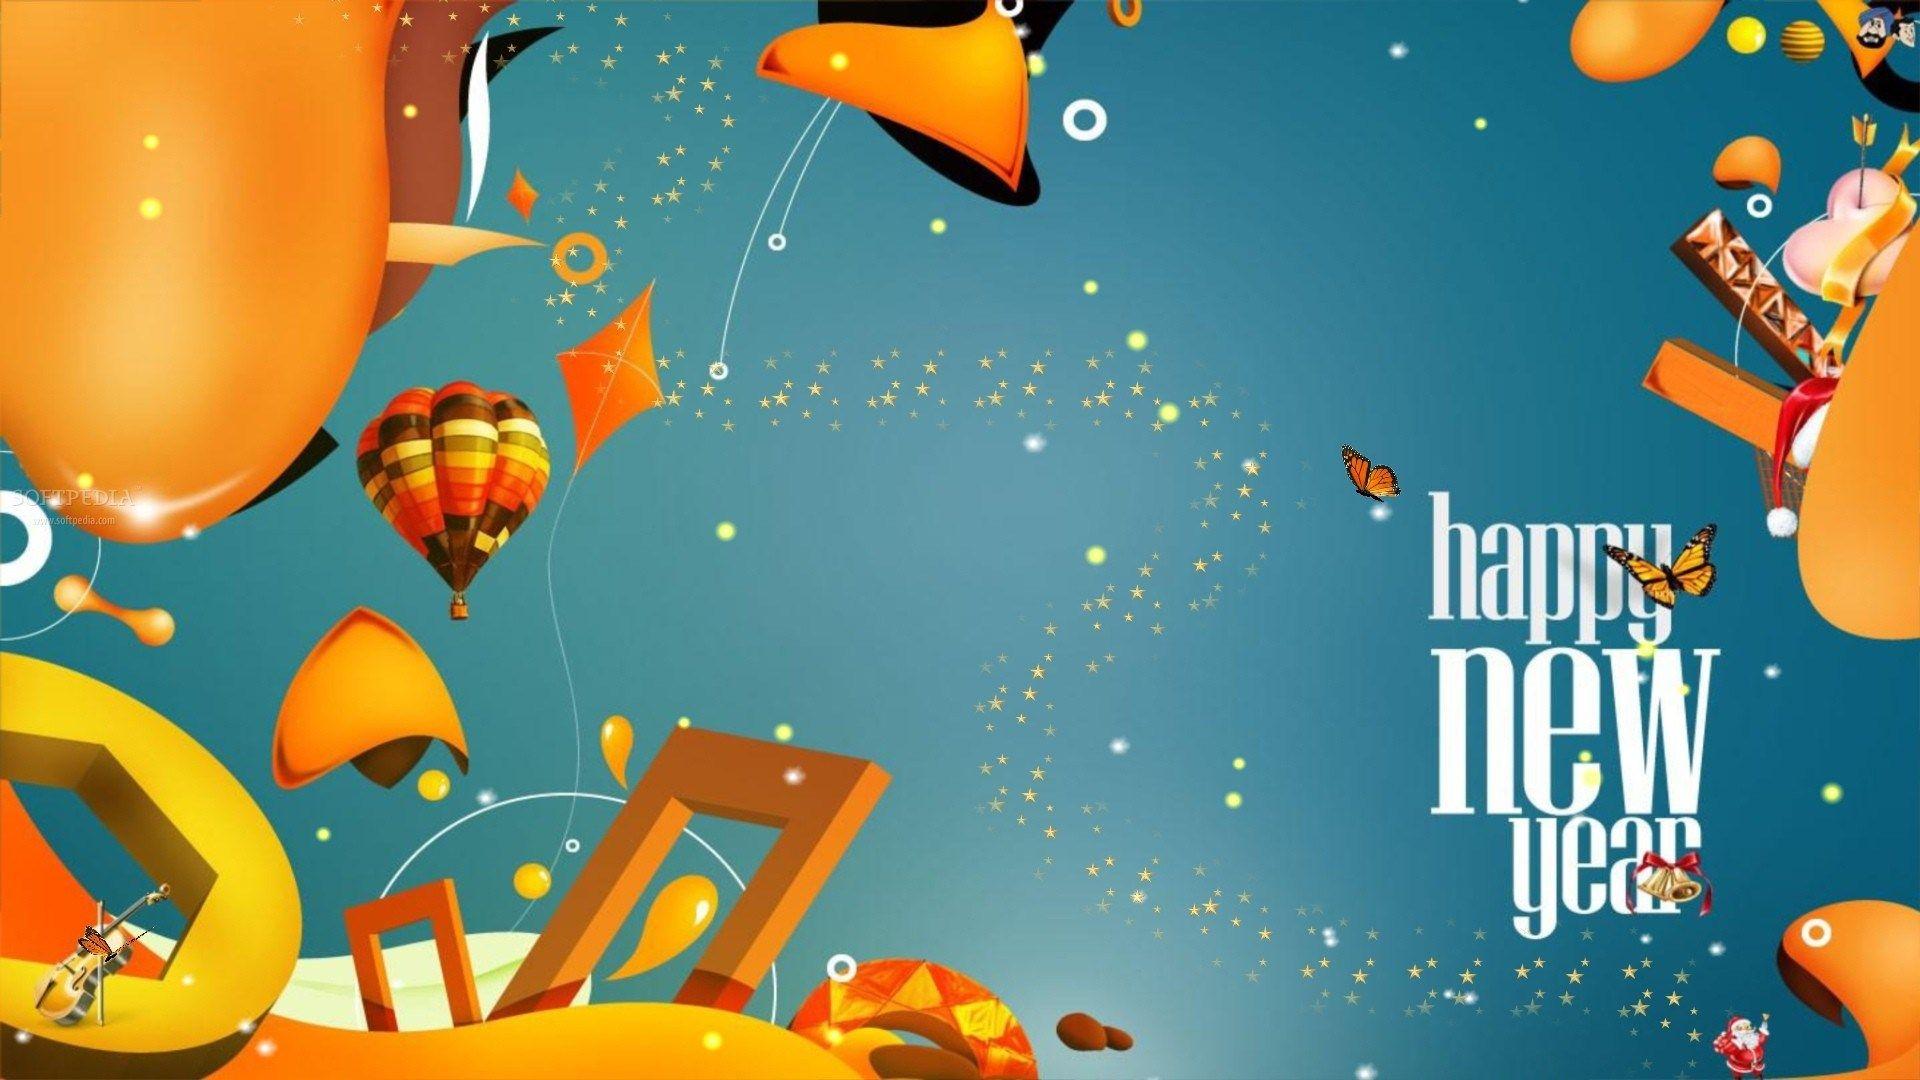 New Year Images Free Download Ololoshenka Pinterest Wallpaper